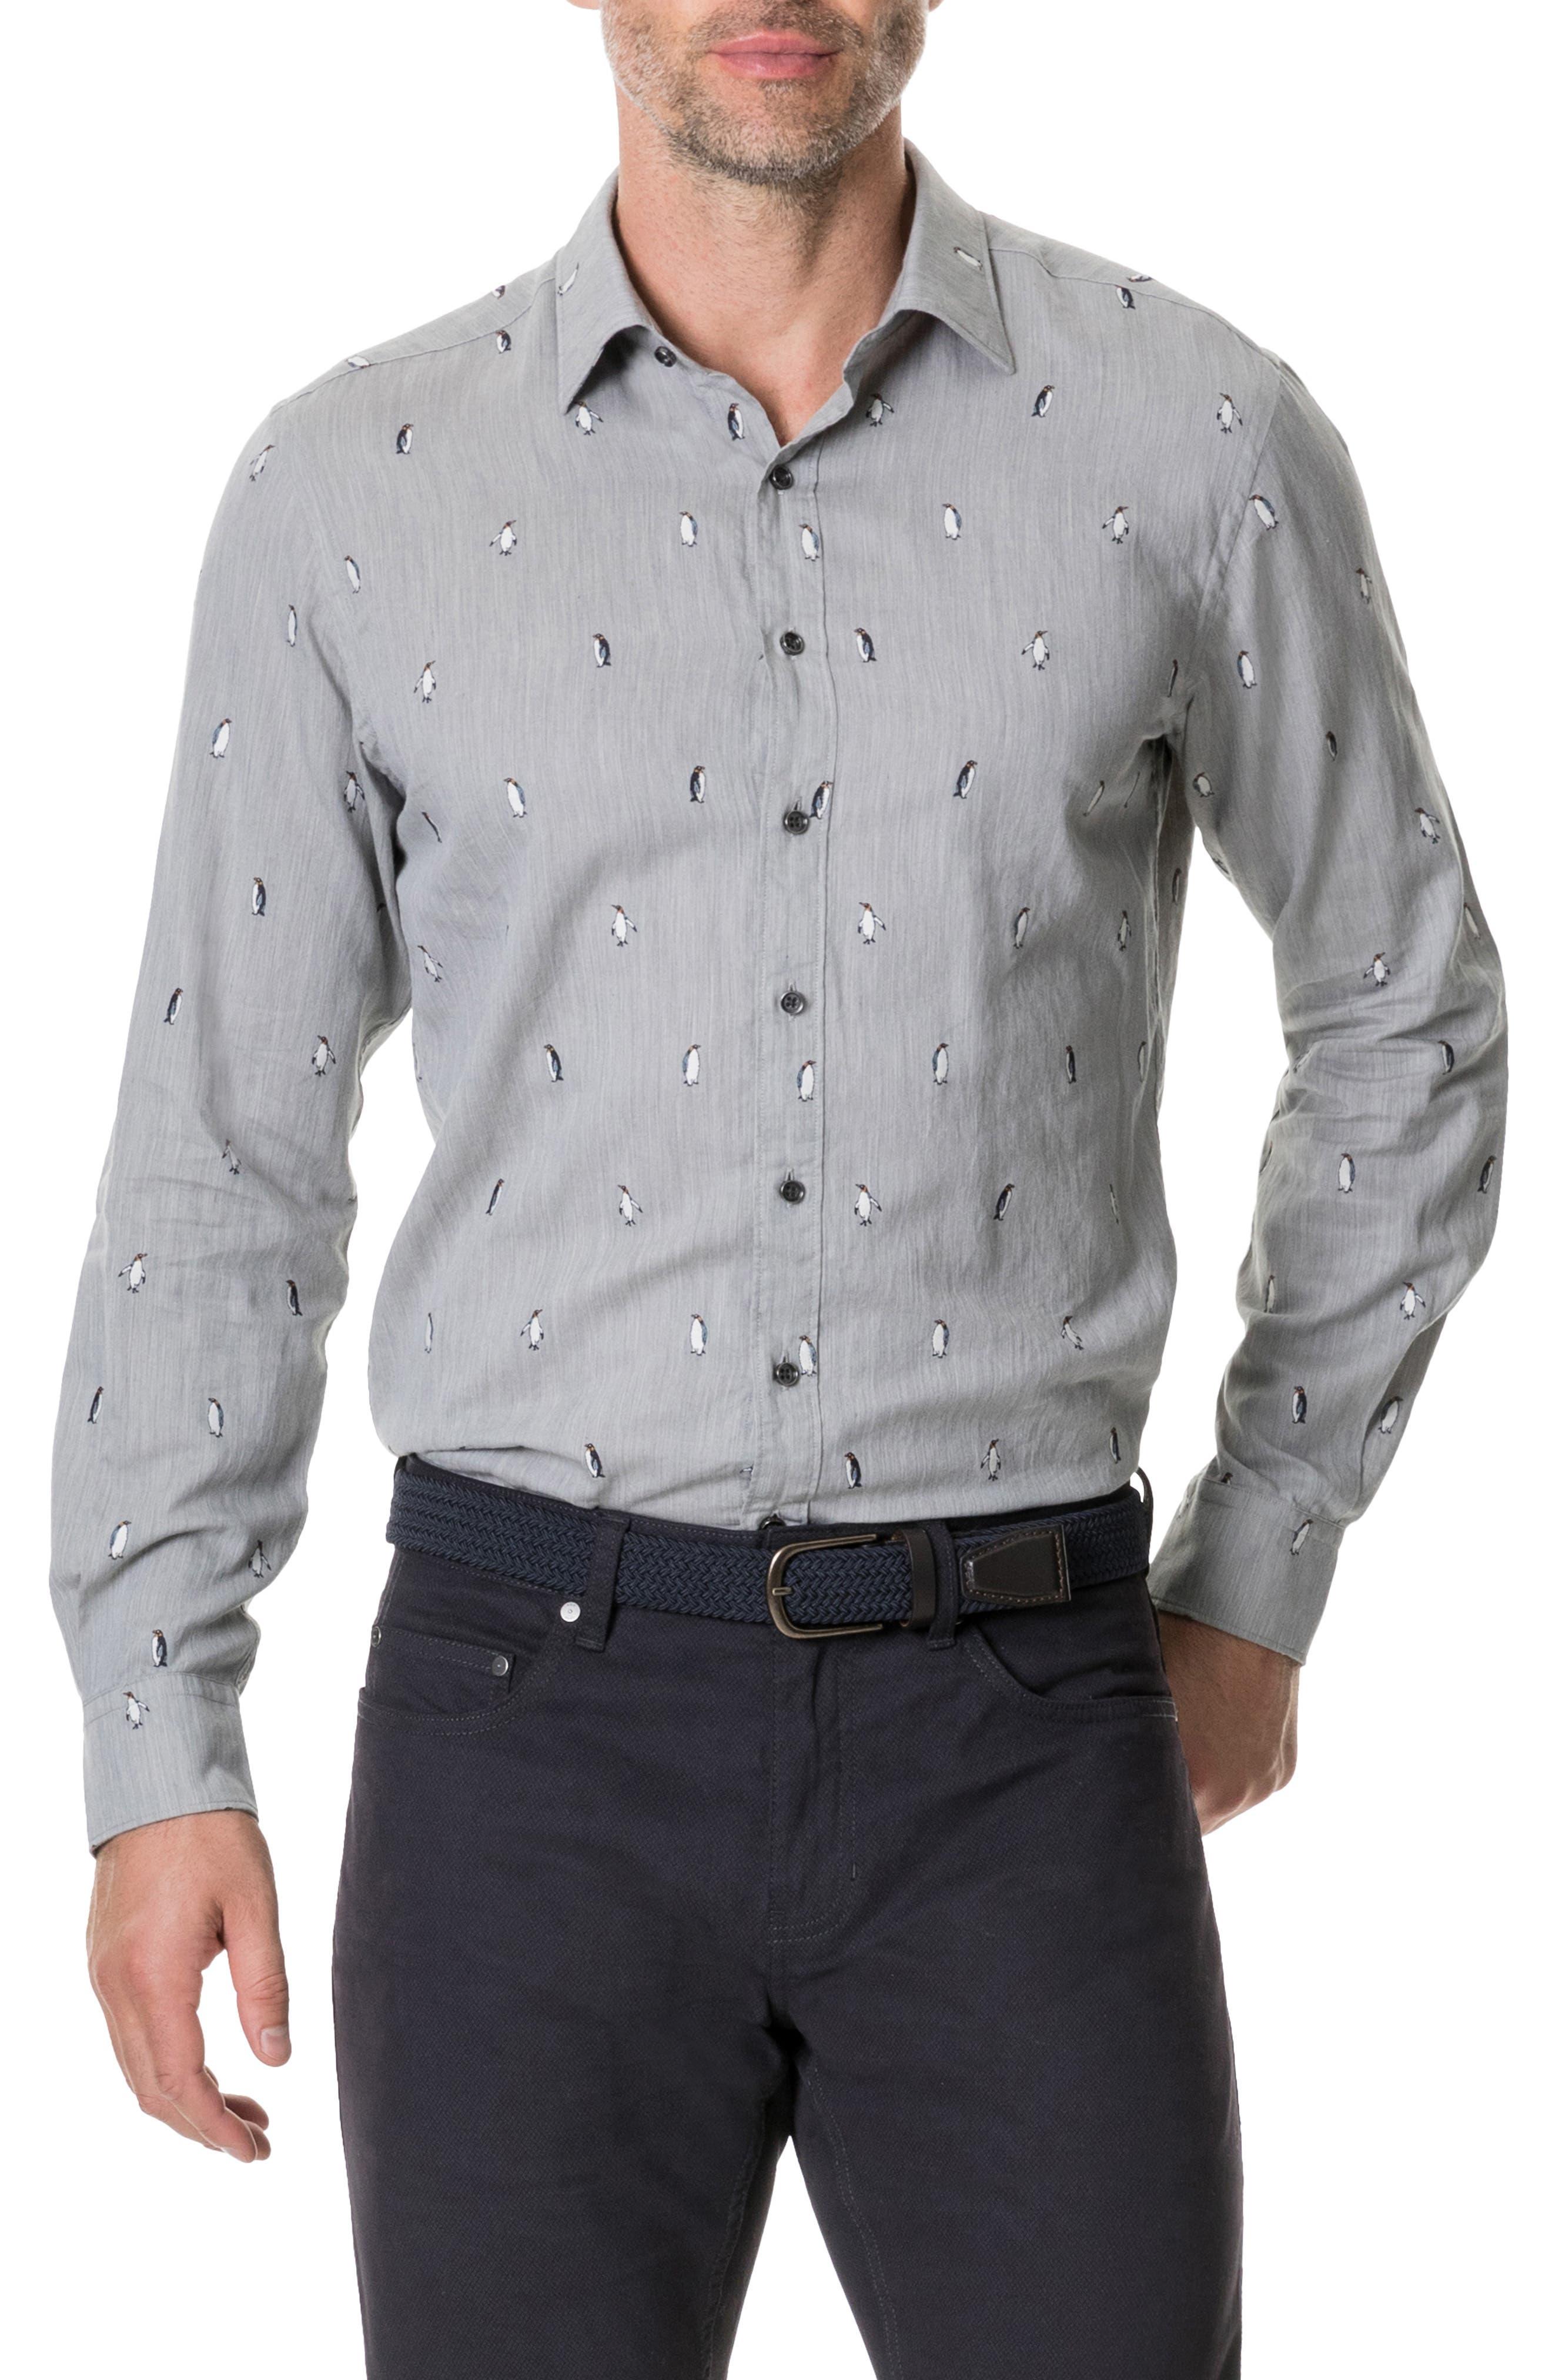 Image of RODD AND GUNN Hillersden Regular Fit Penguin Sport Shirt